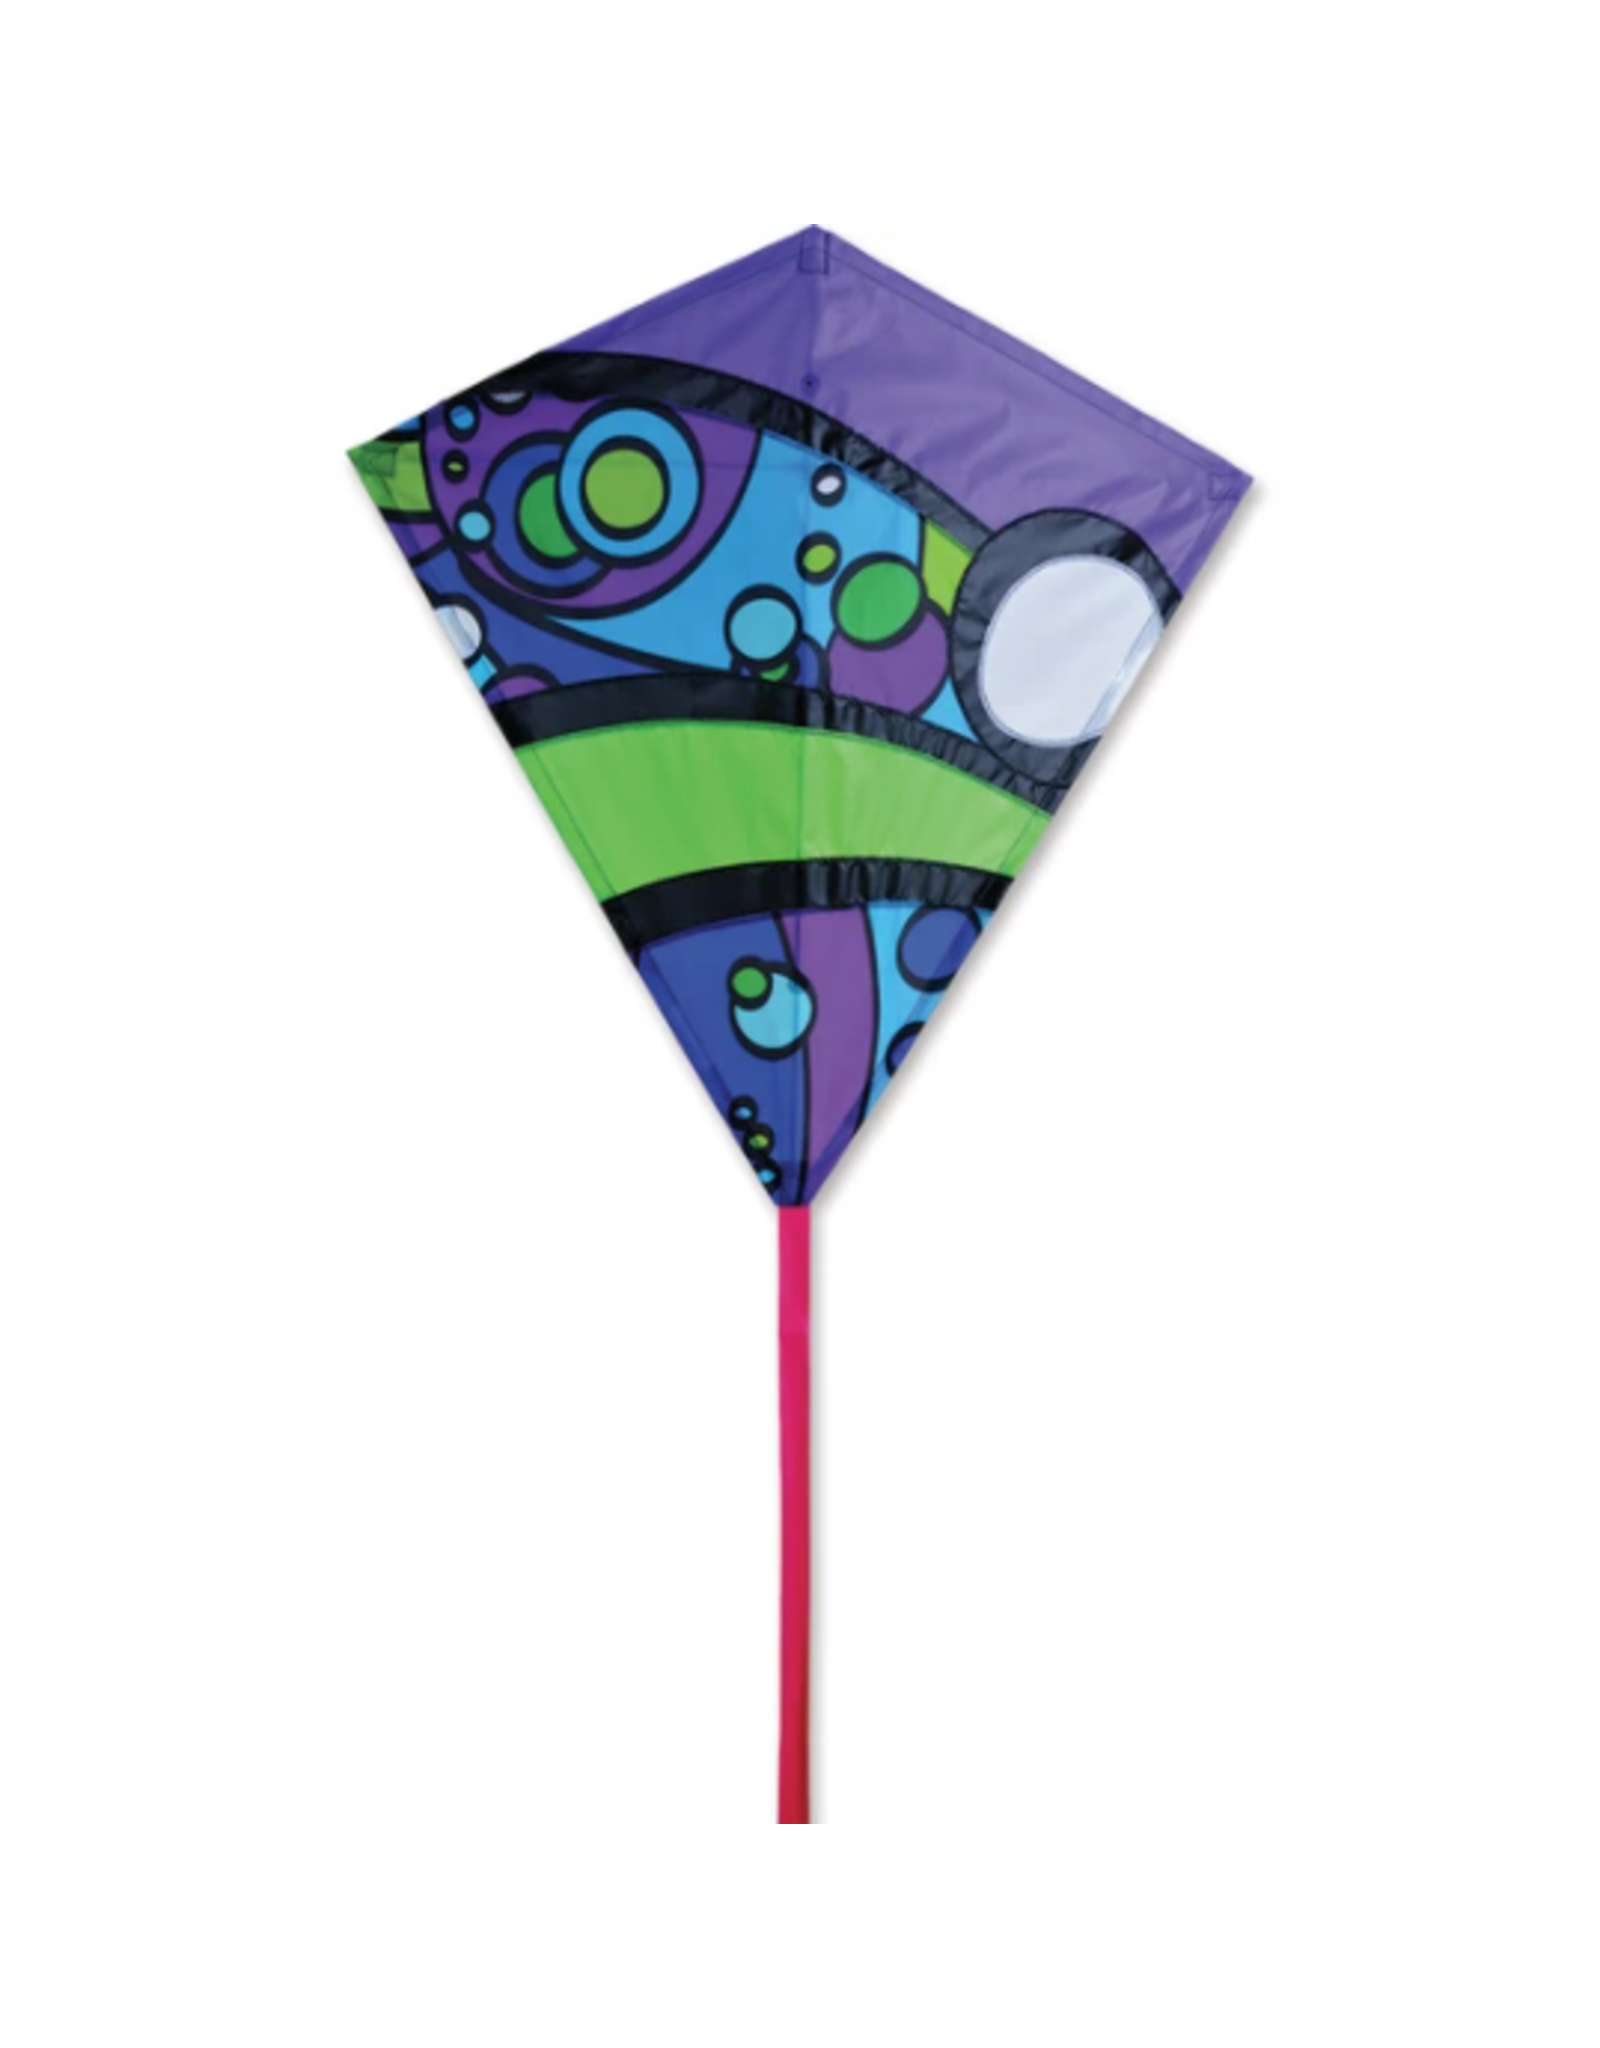 "Premier Kites 30"" Diamond Kite, Cool Orbit Kite"